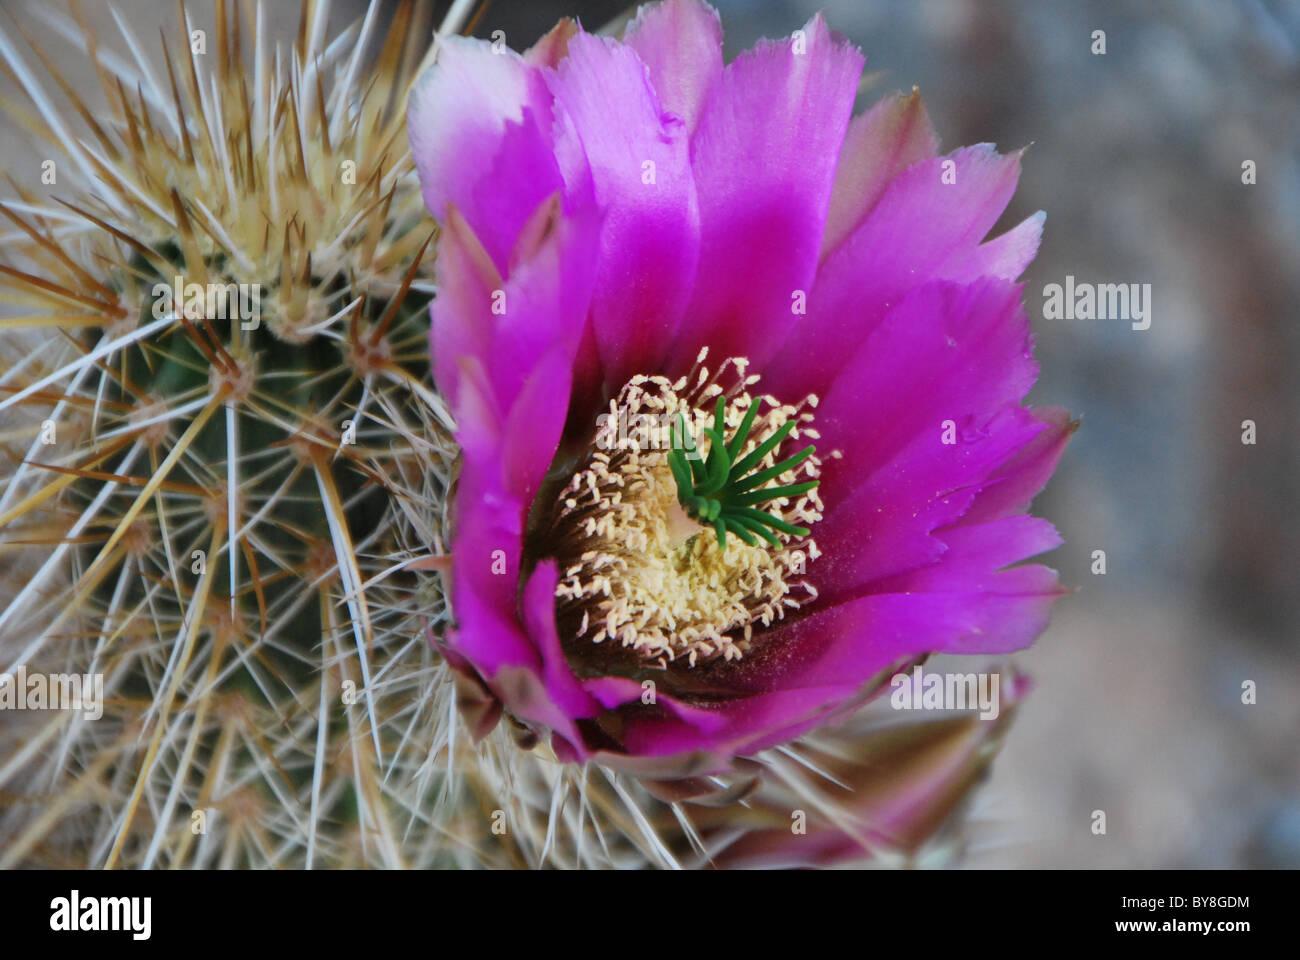 Hedgehog Cactus full bloom in the spring. - Stock Image